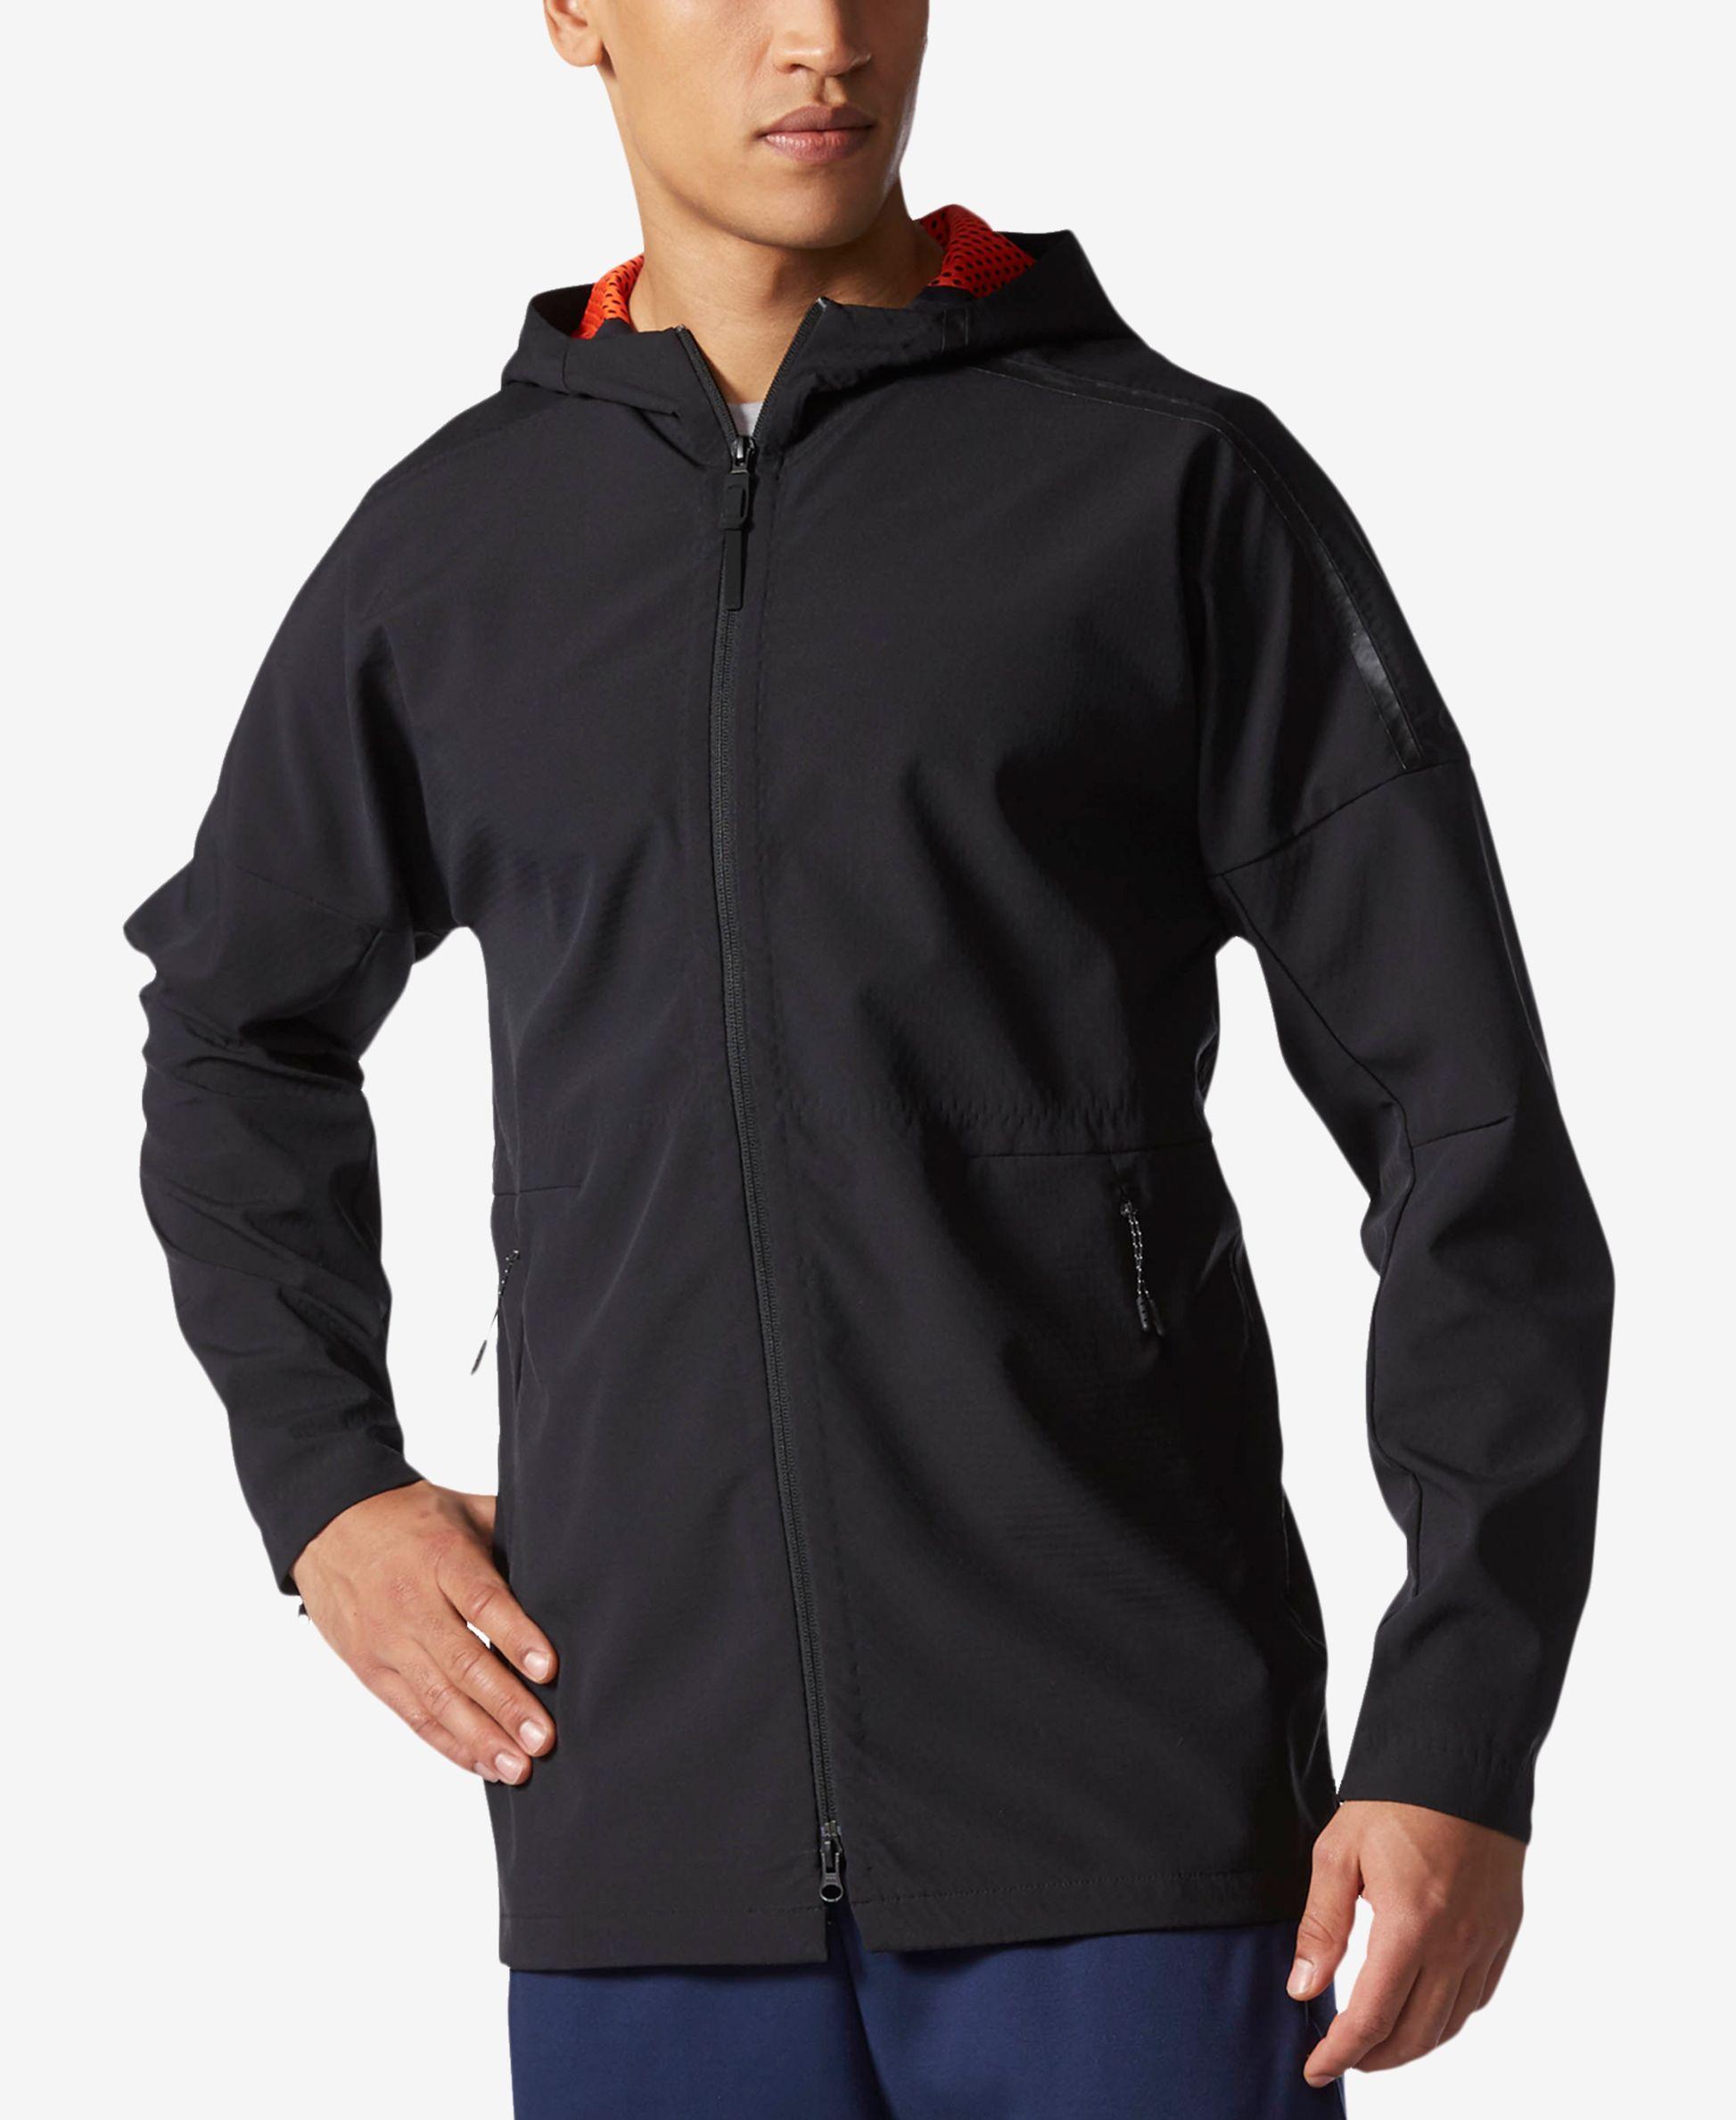 1893f807b493 adidas Men s Zne 90 10 Jacket